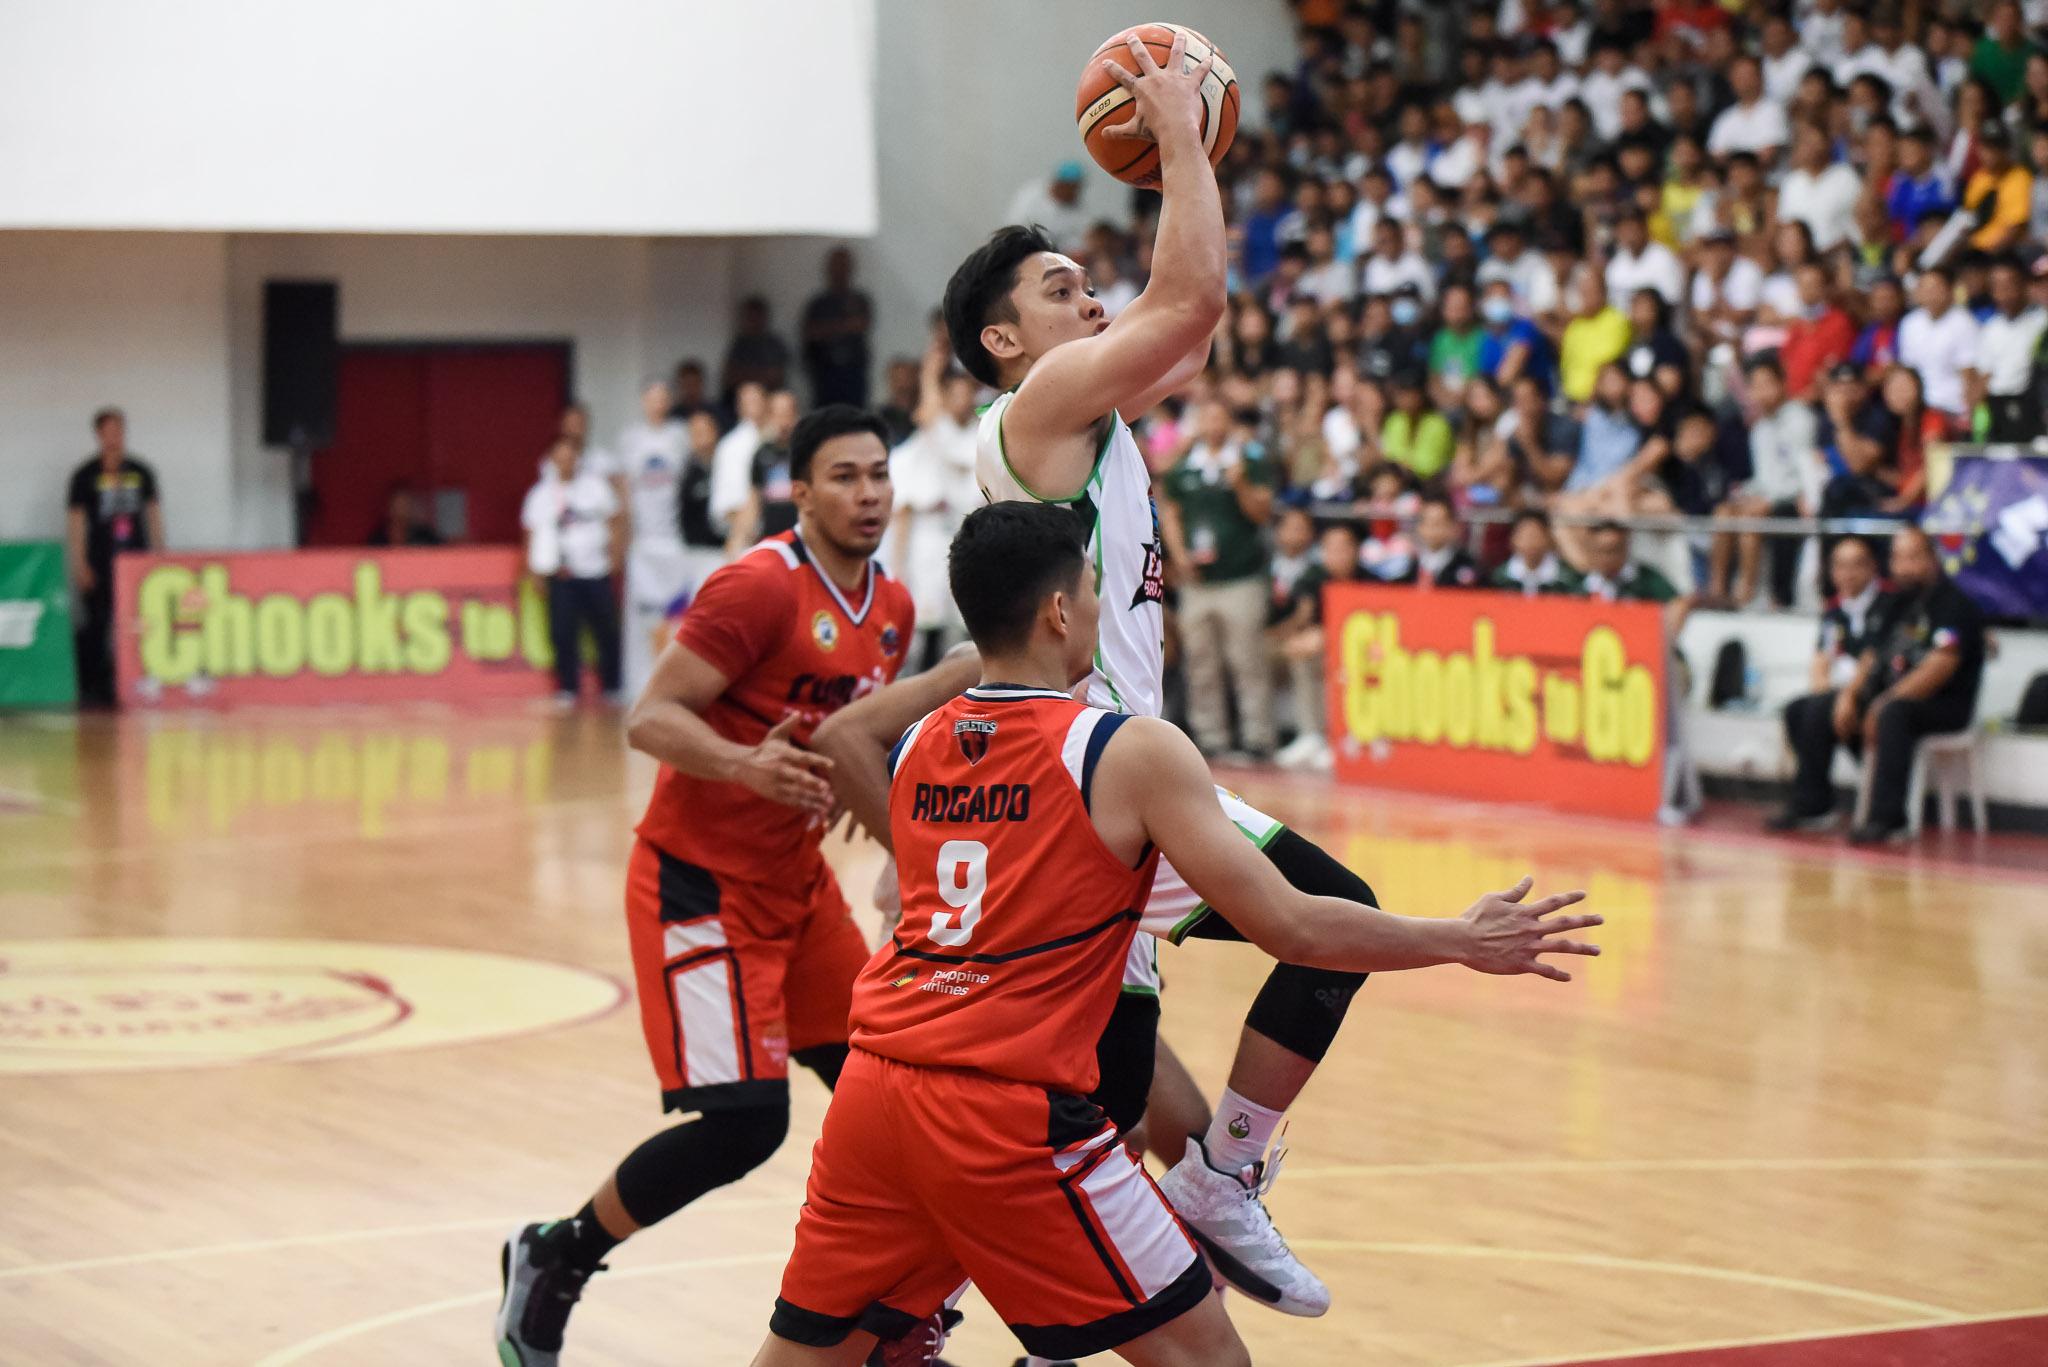 Chooks-MPBL-2019-Batangas-vs-Zamboanga-Manzo Murrell ends UP career as he and Manzo join PBA Draft Basketball MPBL News UAAP UP  - philippine sports news